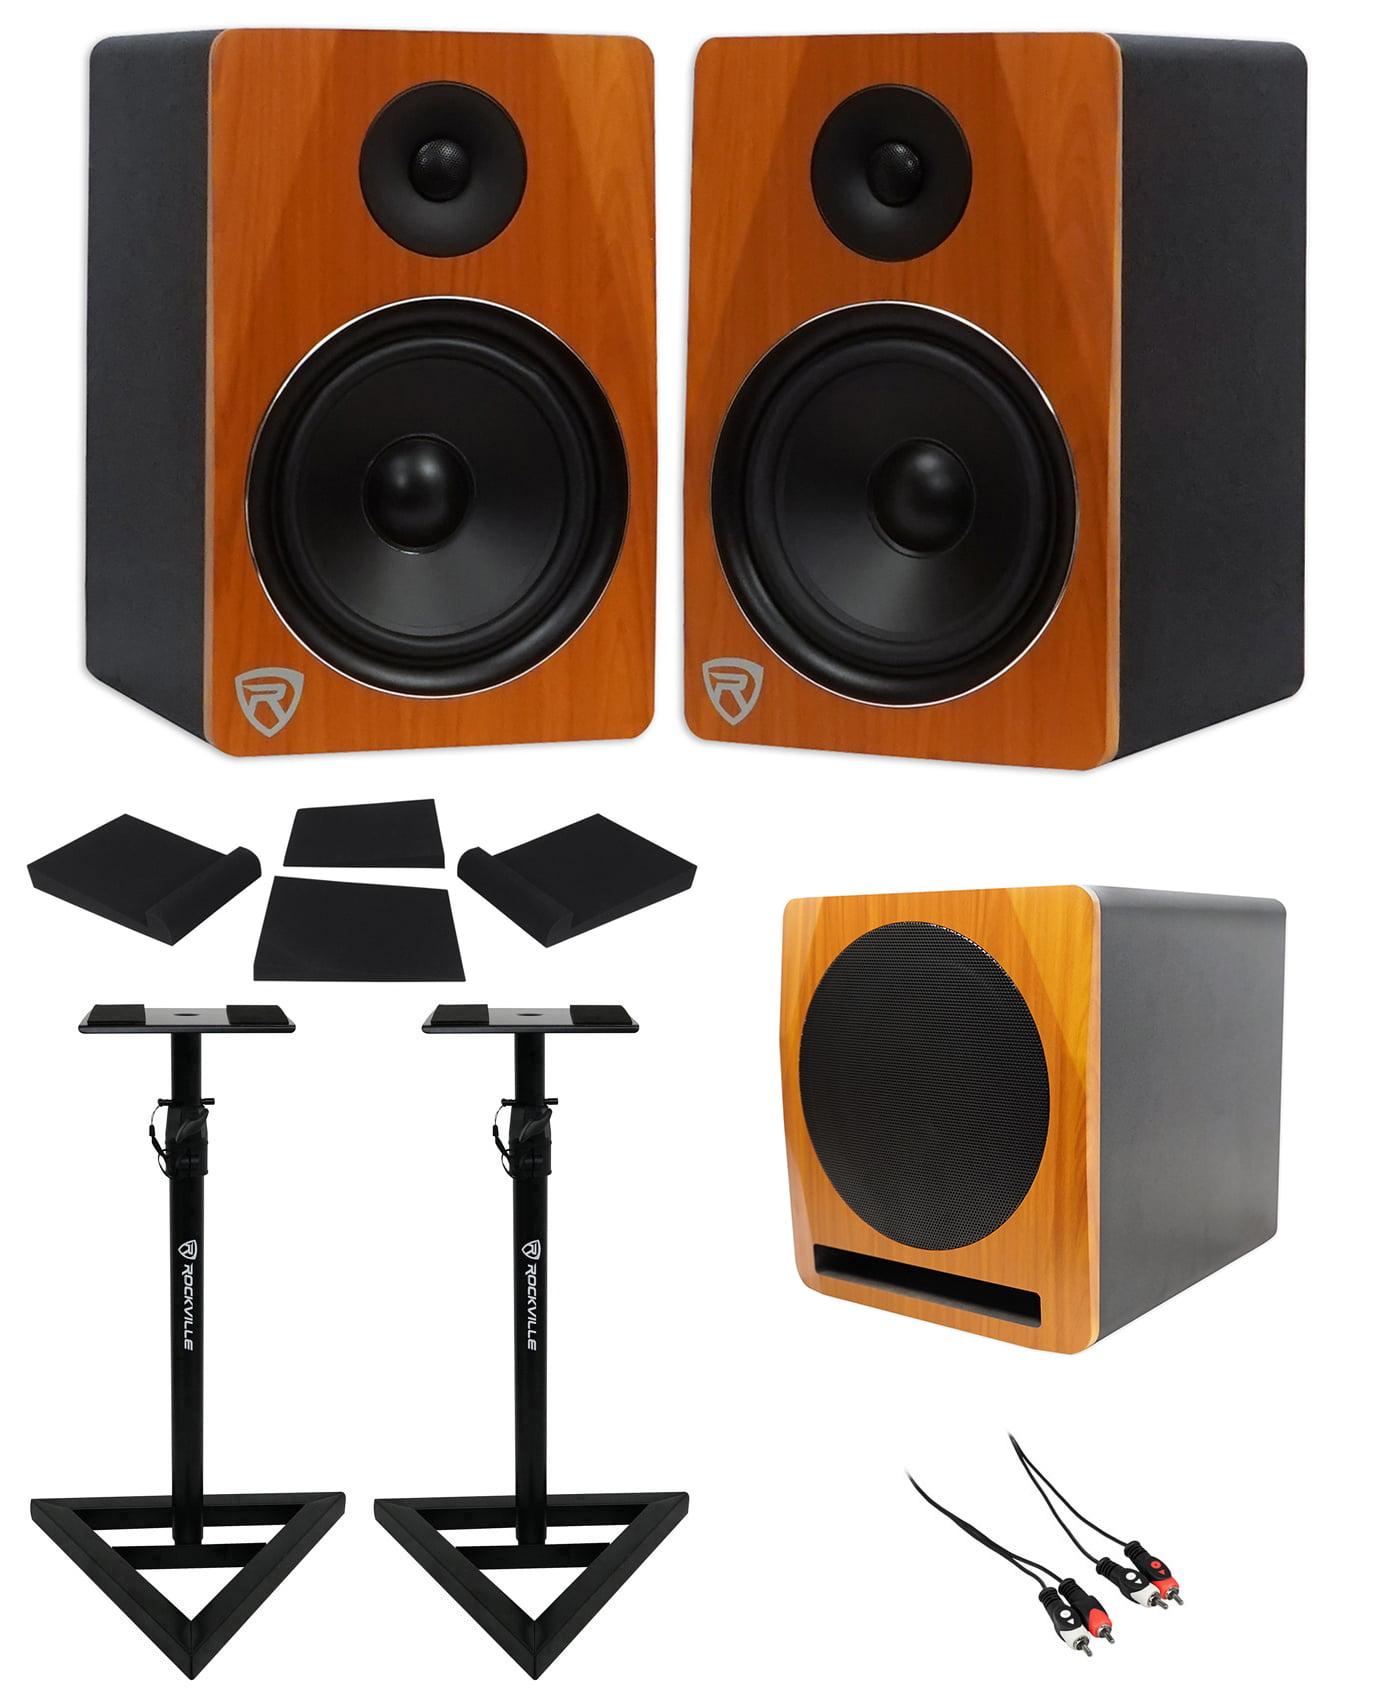 "(2) Rockville APM8C 8"" Powered Studio Monitors+Active 10"" Subwoofer+Stands+Pads by ROCKVILLE"